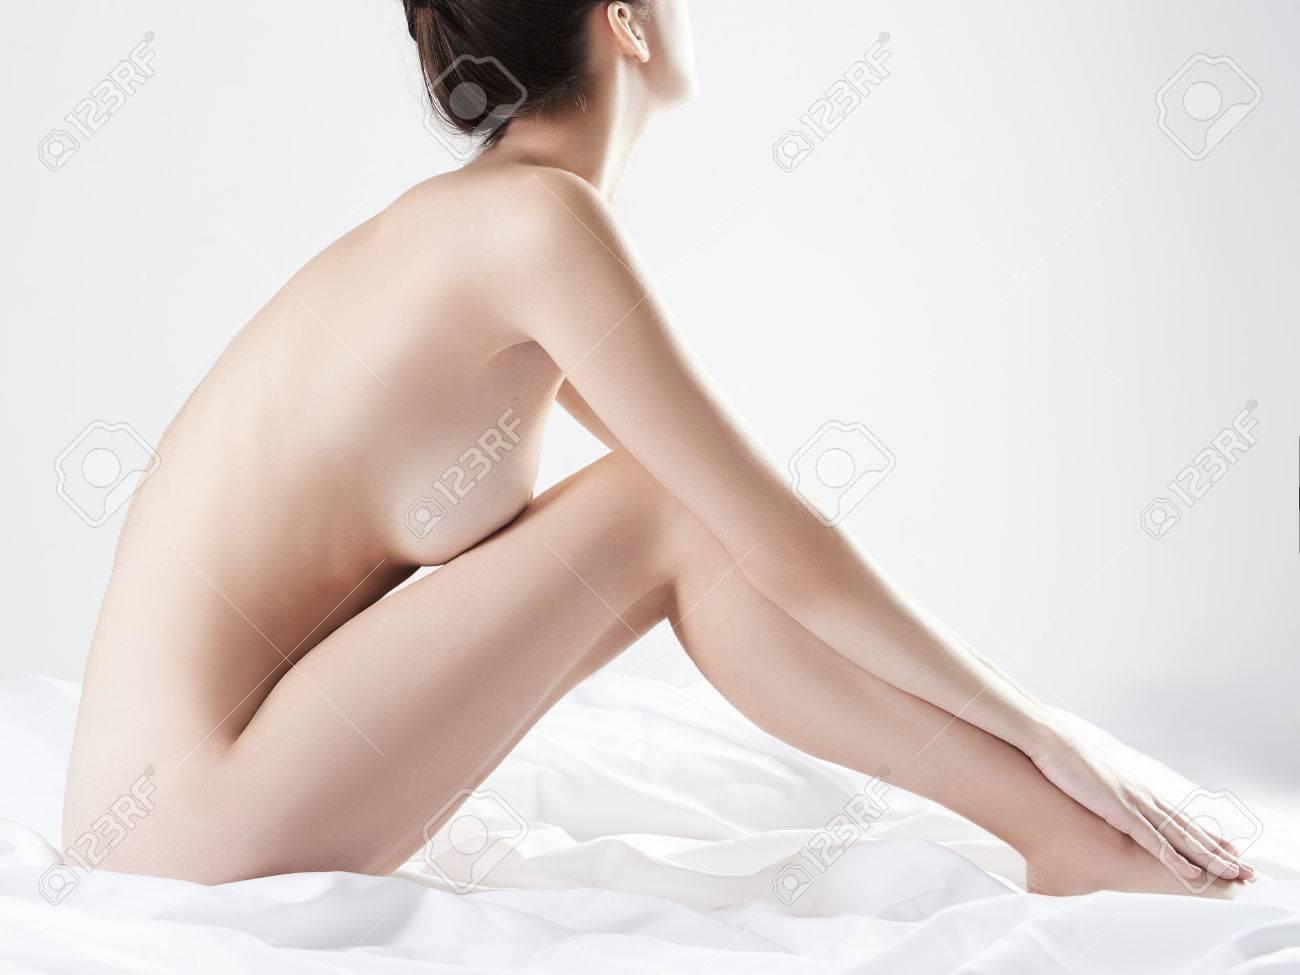 ragazza nuda sexy foto